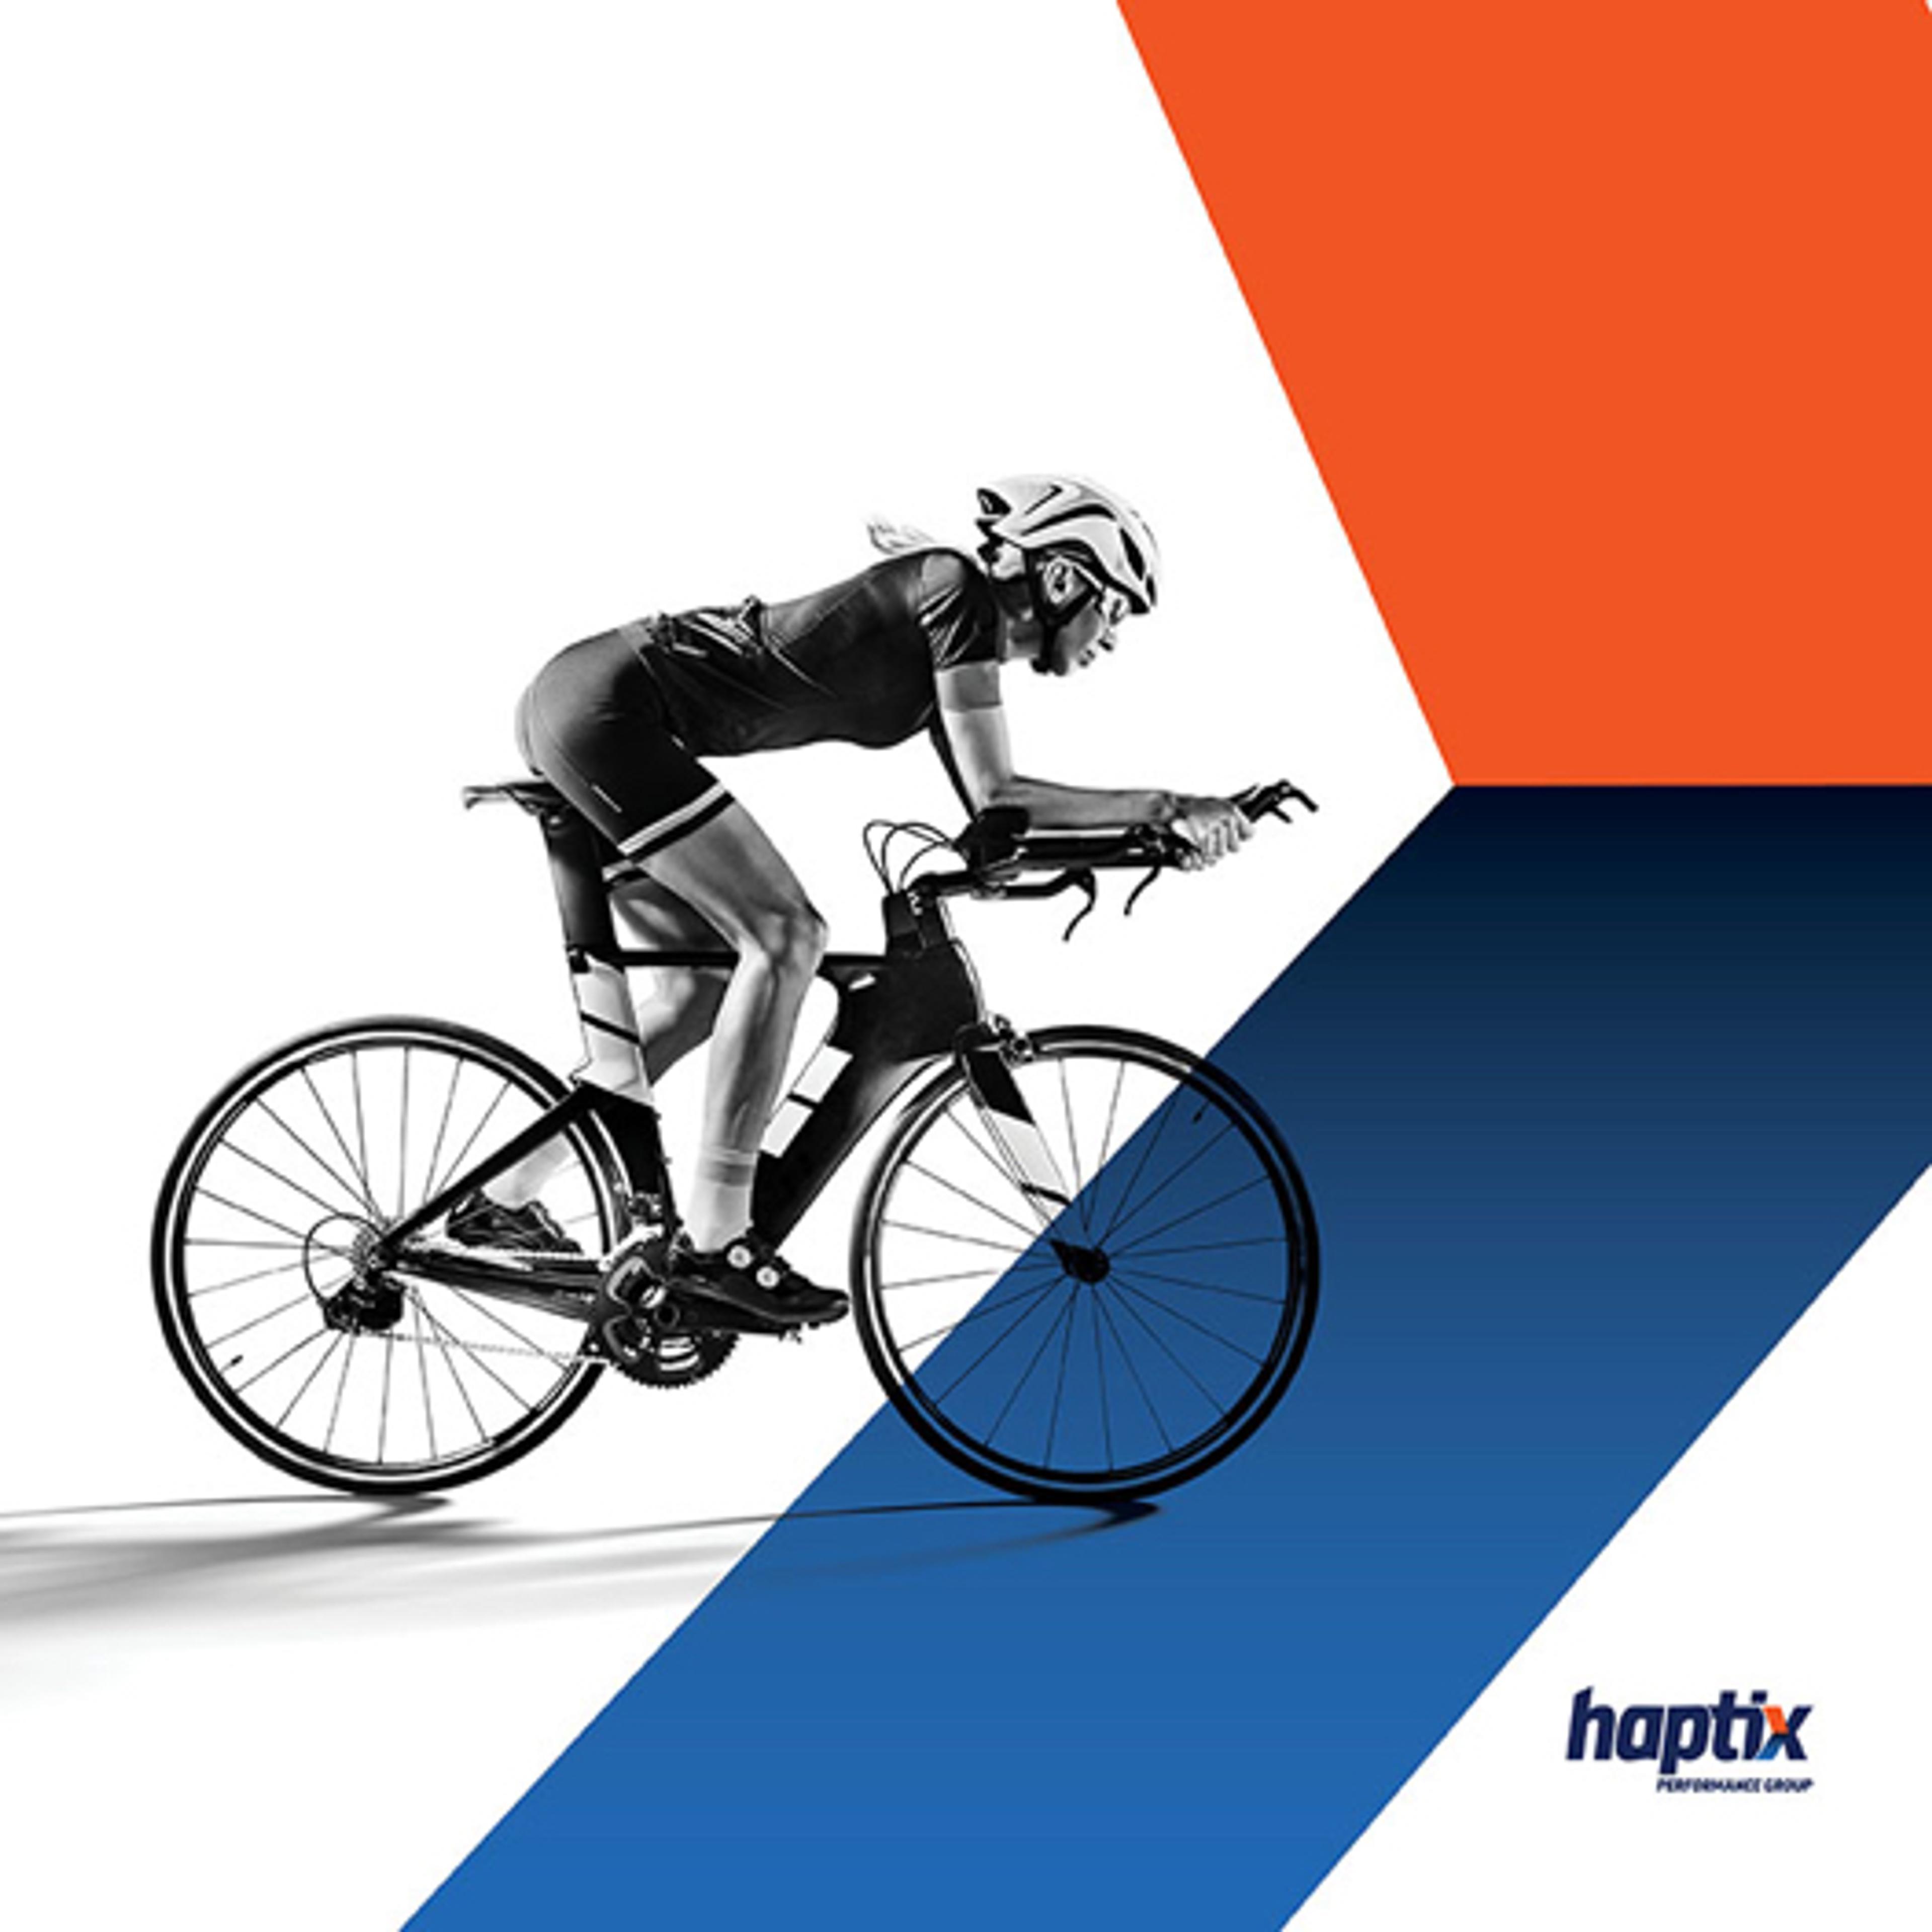 Haptix brand design piece